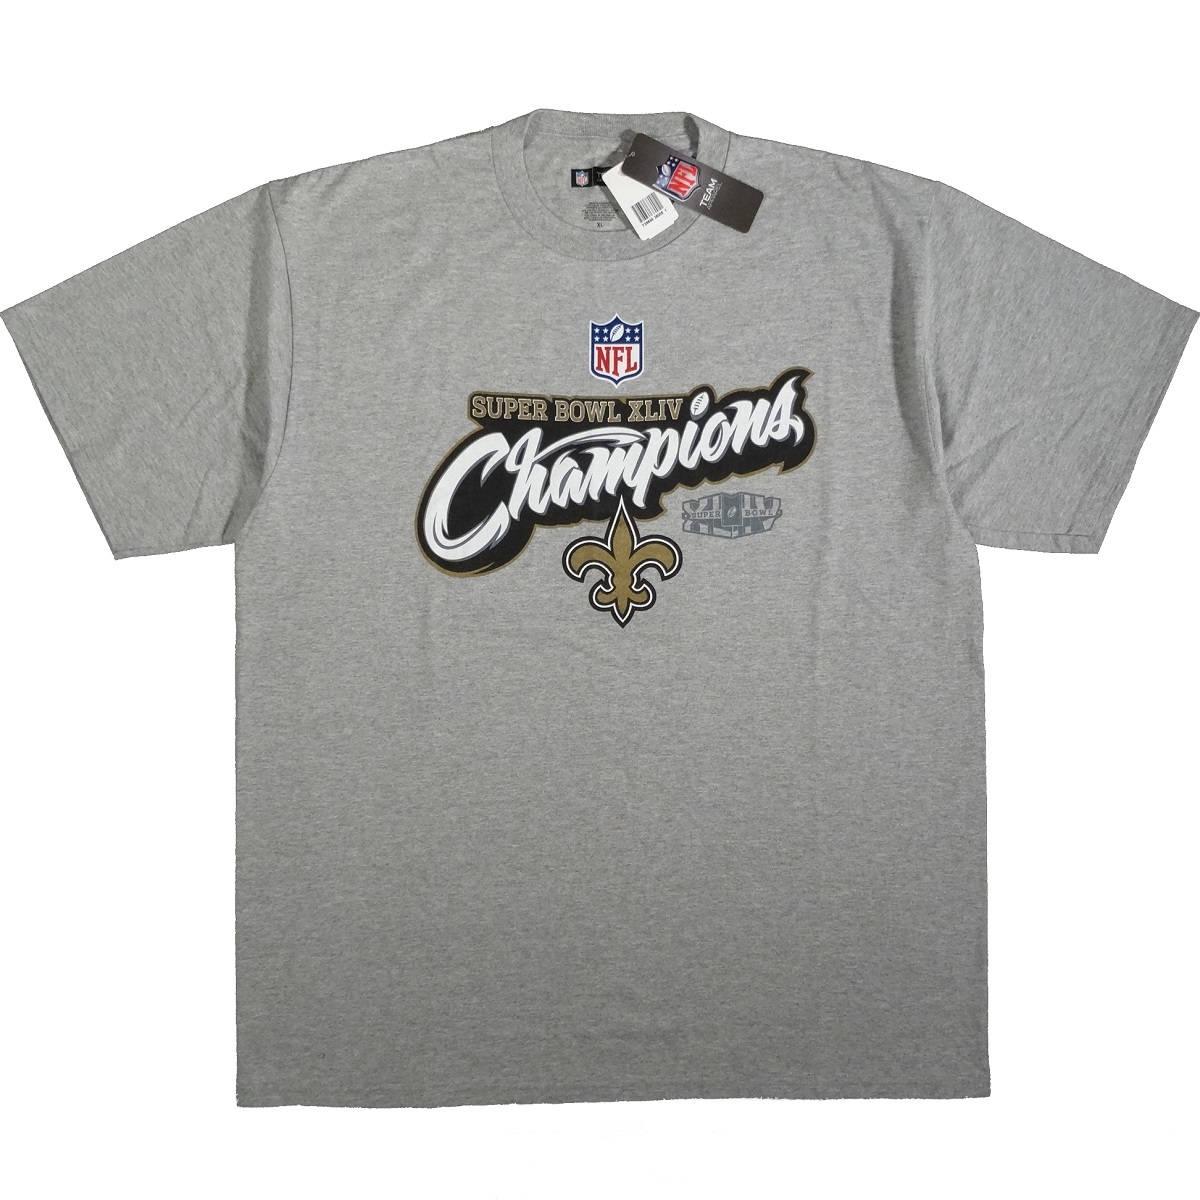 New Orleans Saints Super Bowl Champions Front of Shirt